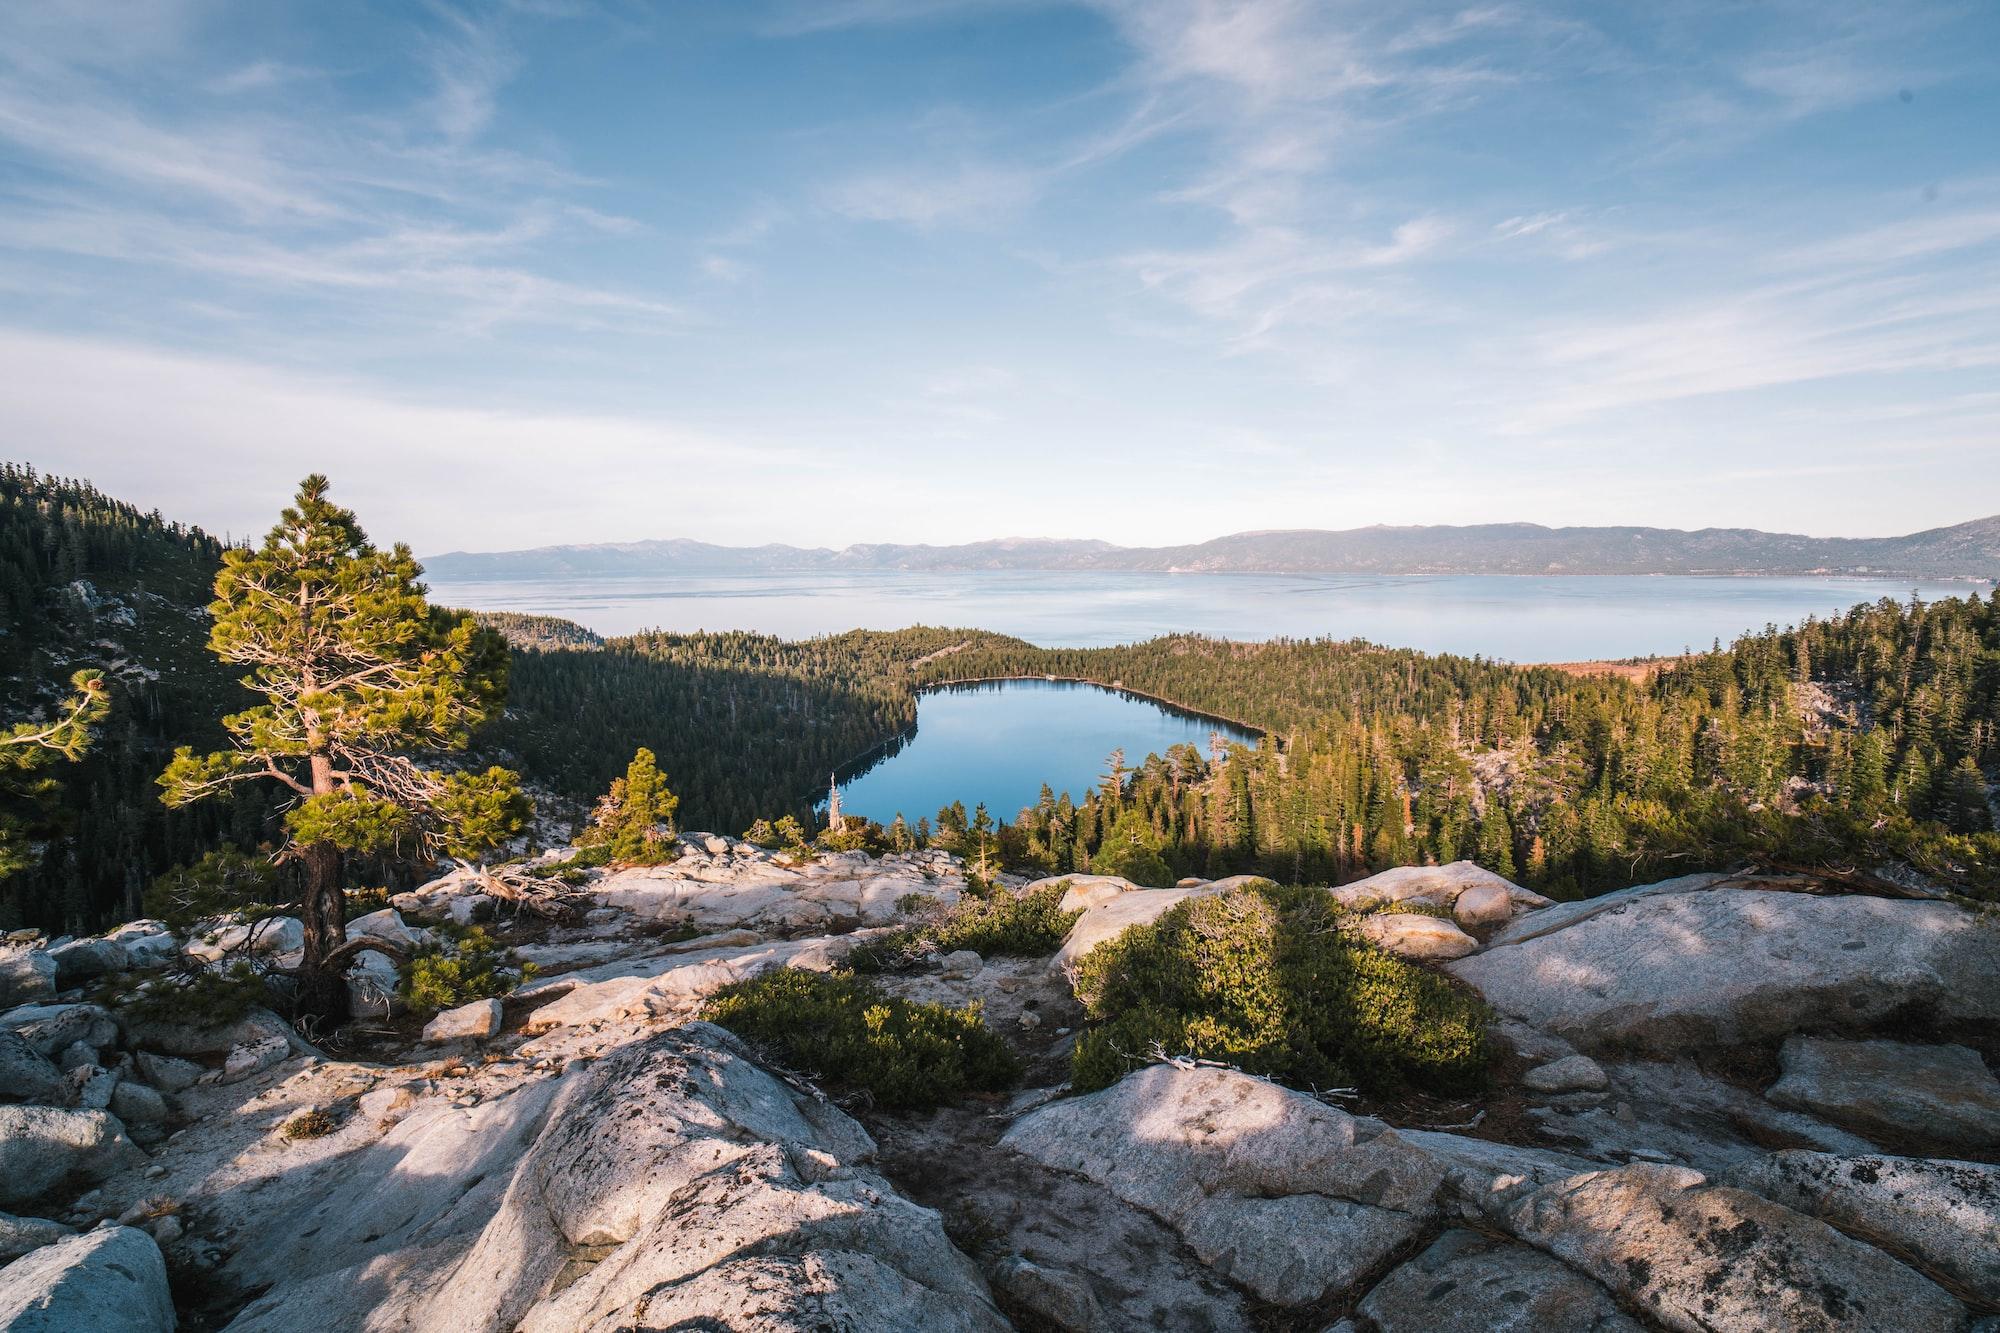 Update: Lake Tahoe, CA - Reopened